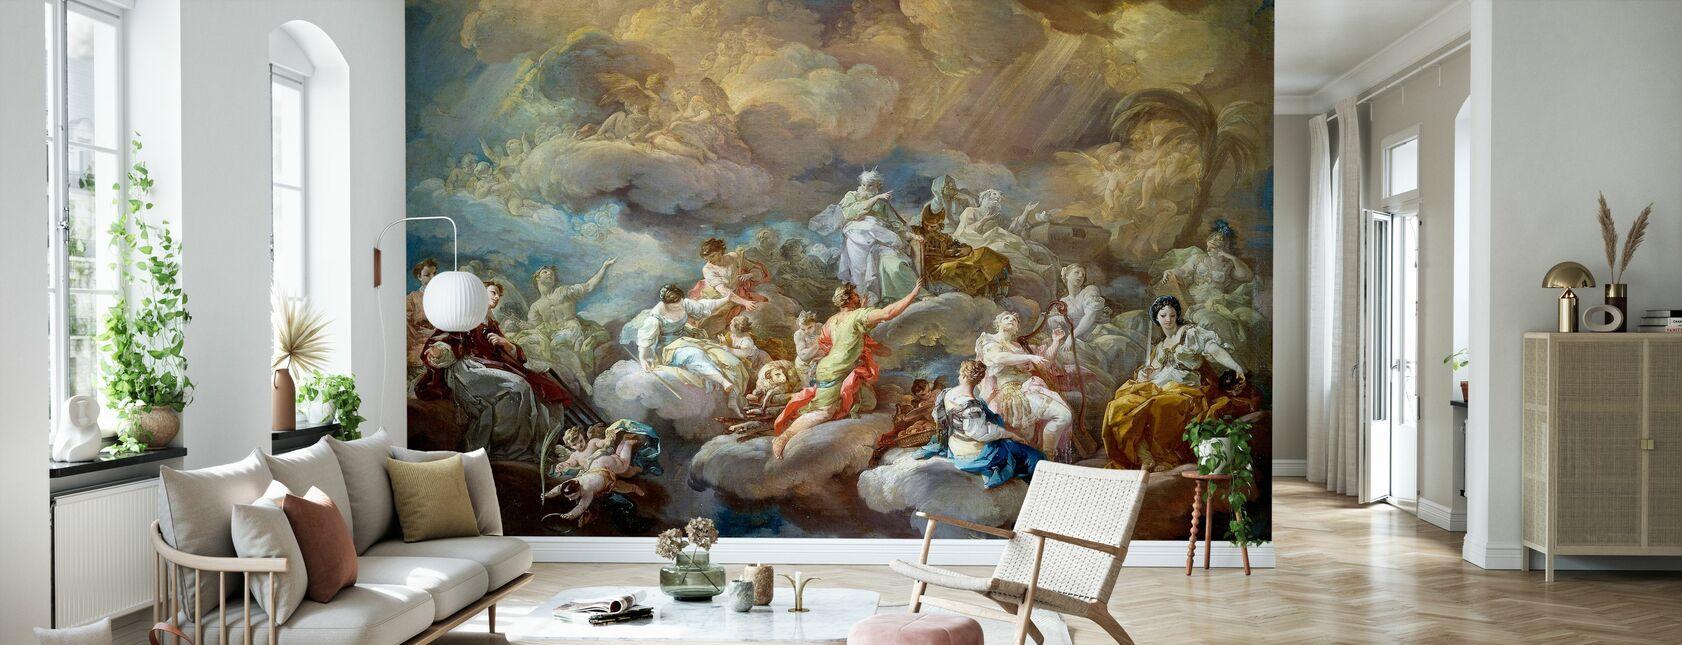 Helgon i ära - Corrado Giaquinto - Tapet - Vardagsrum